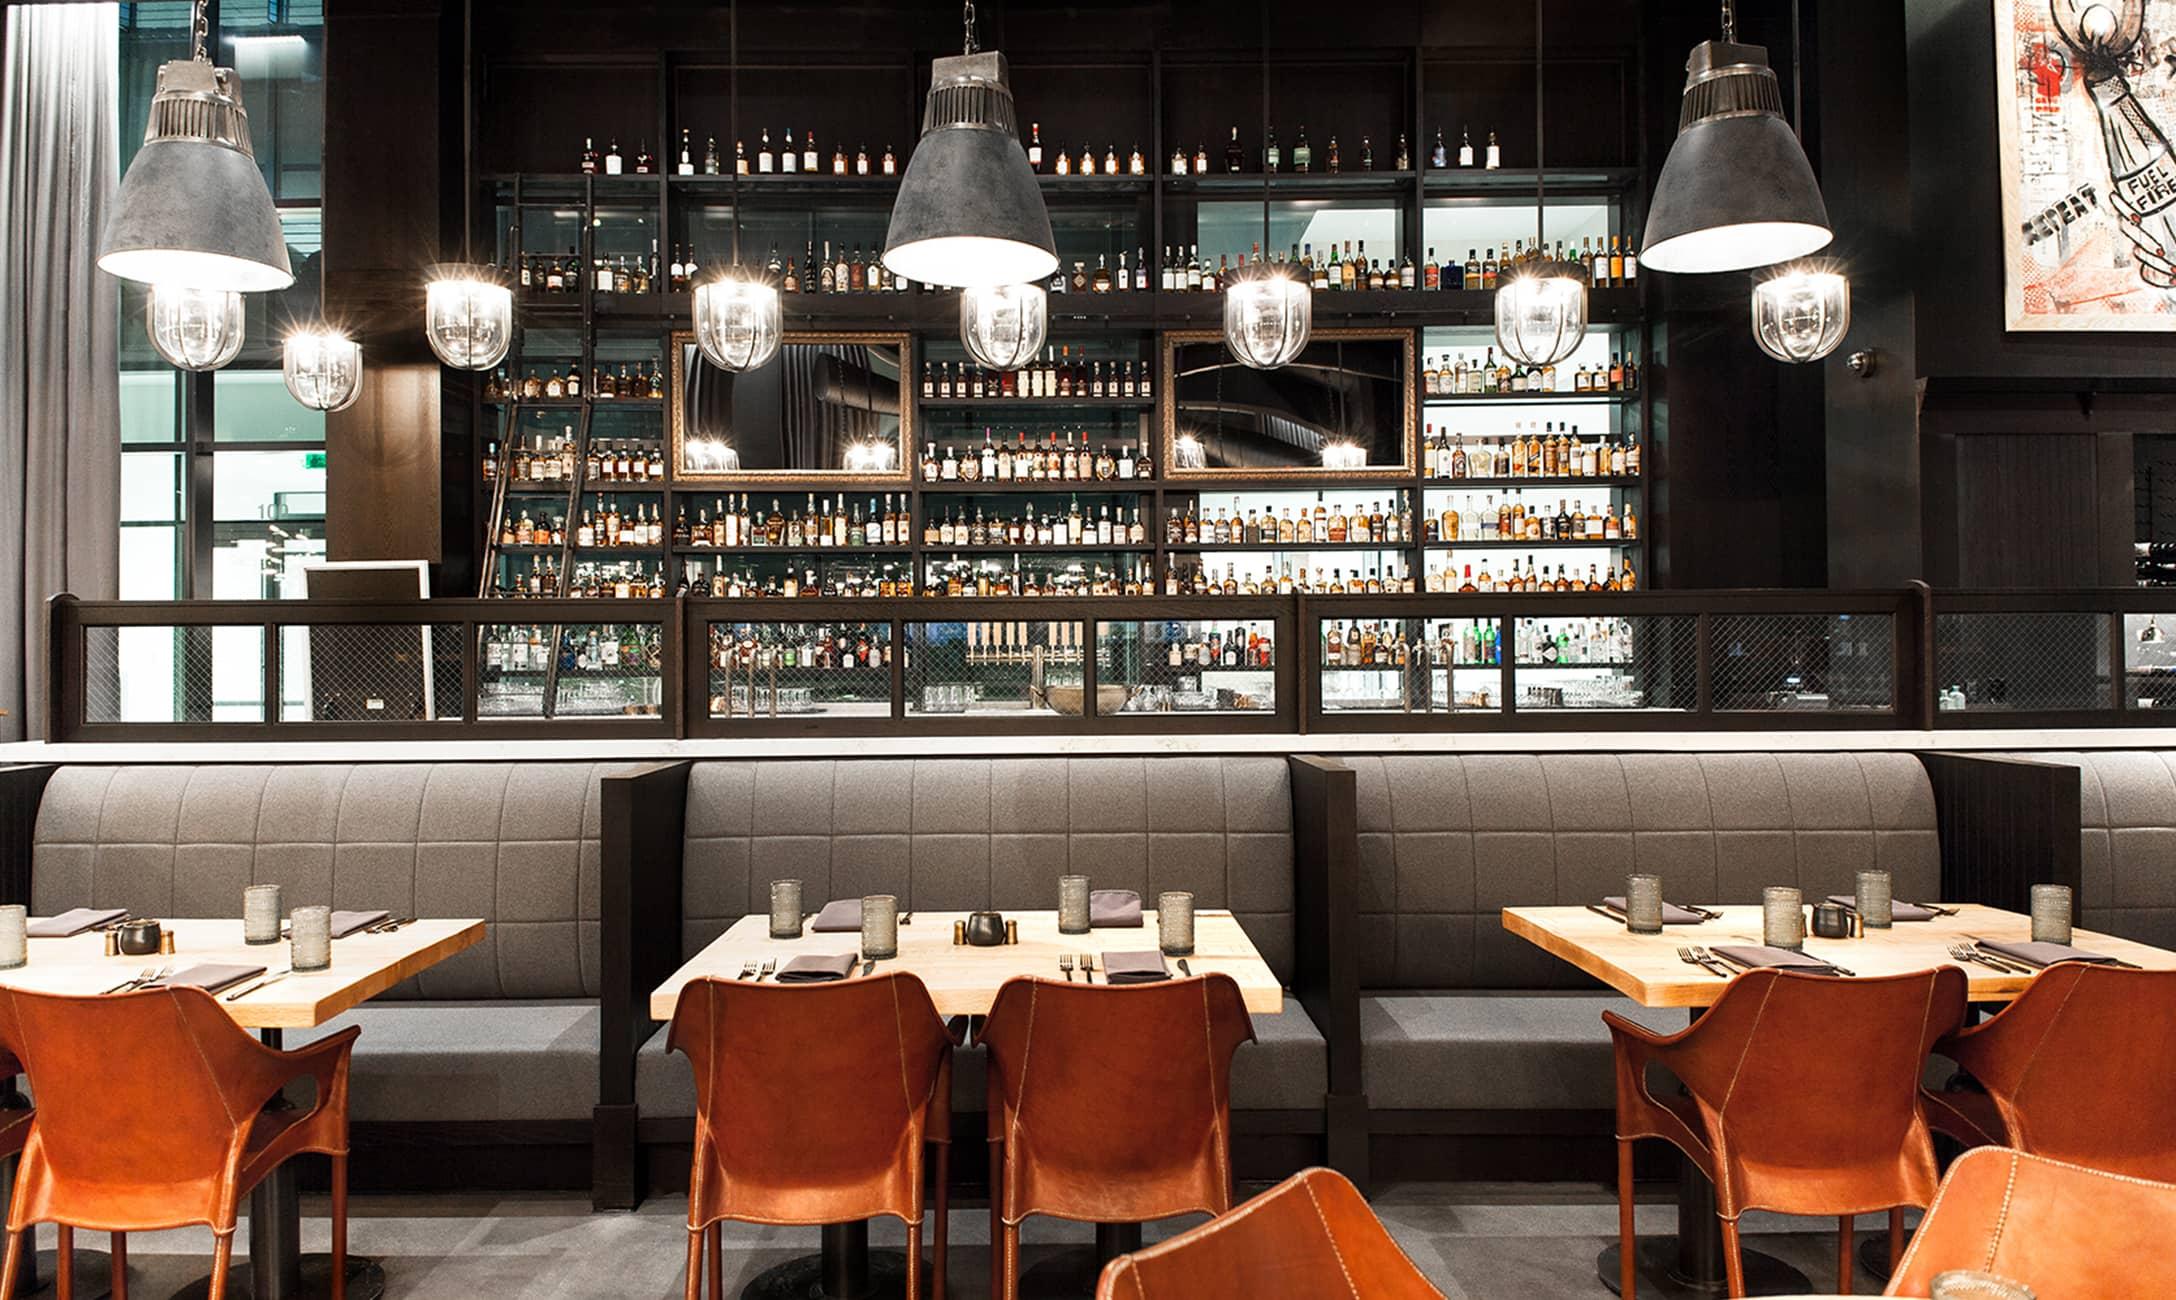 Hearth & Dram Bar interior